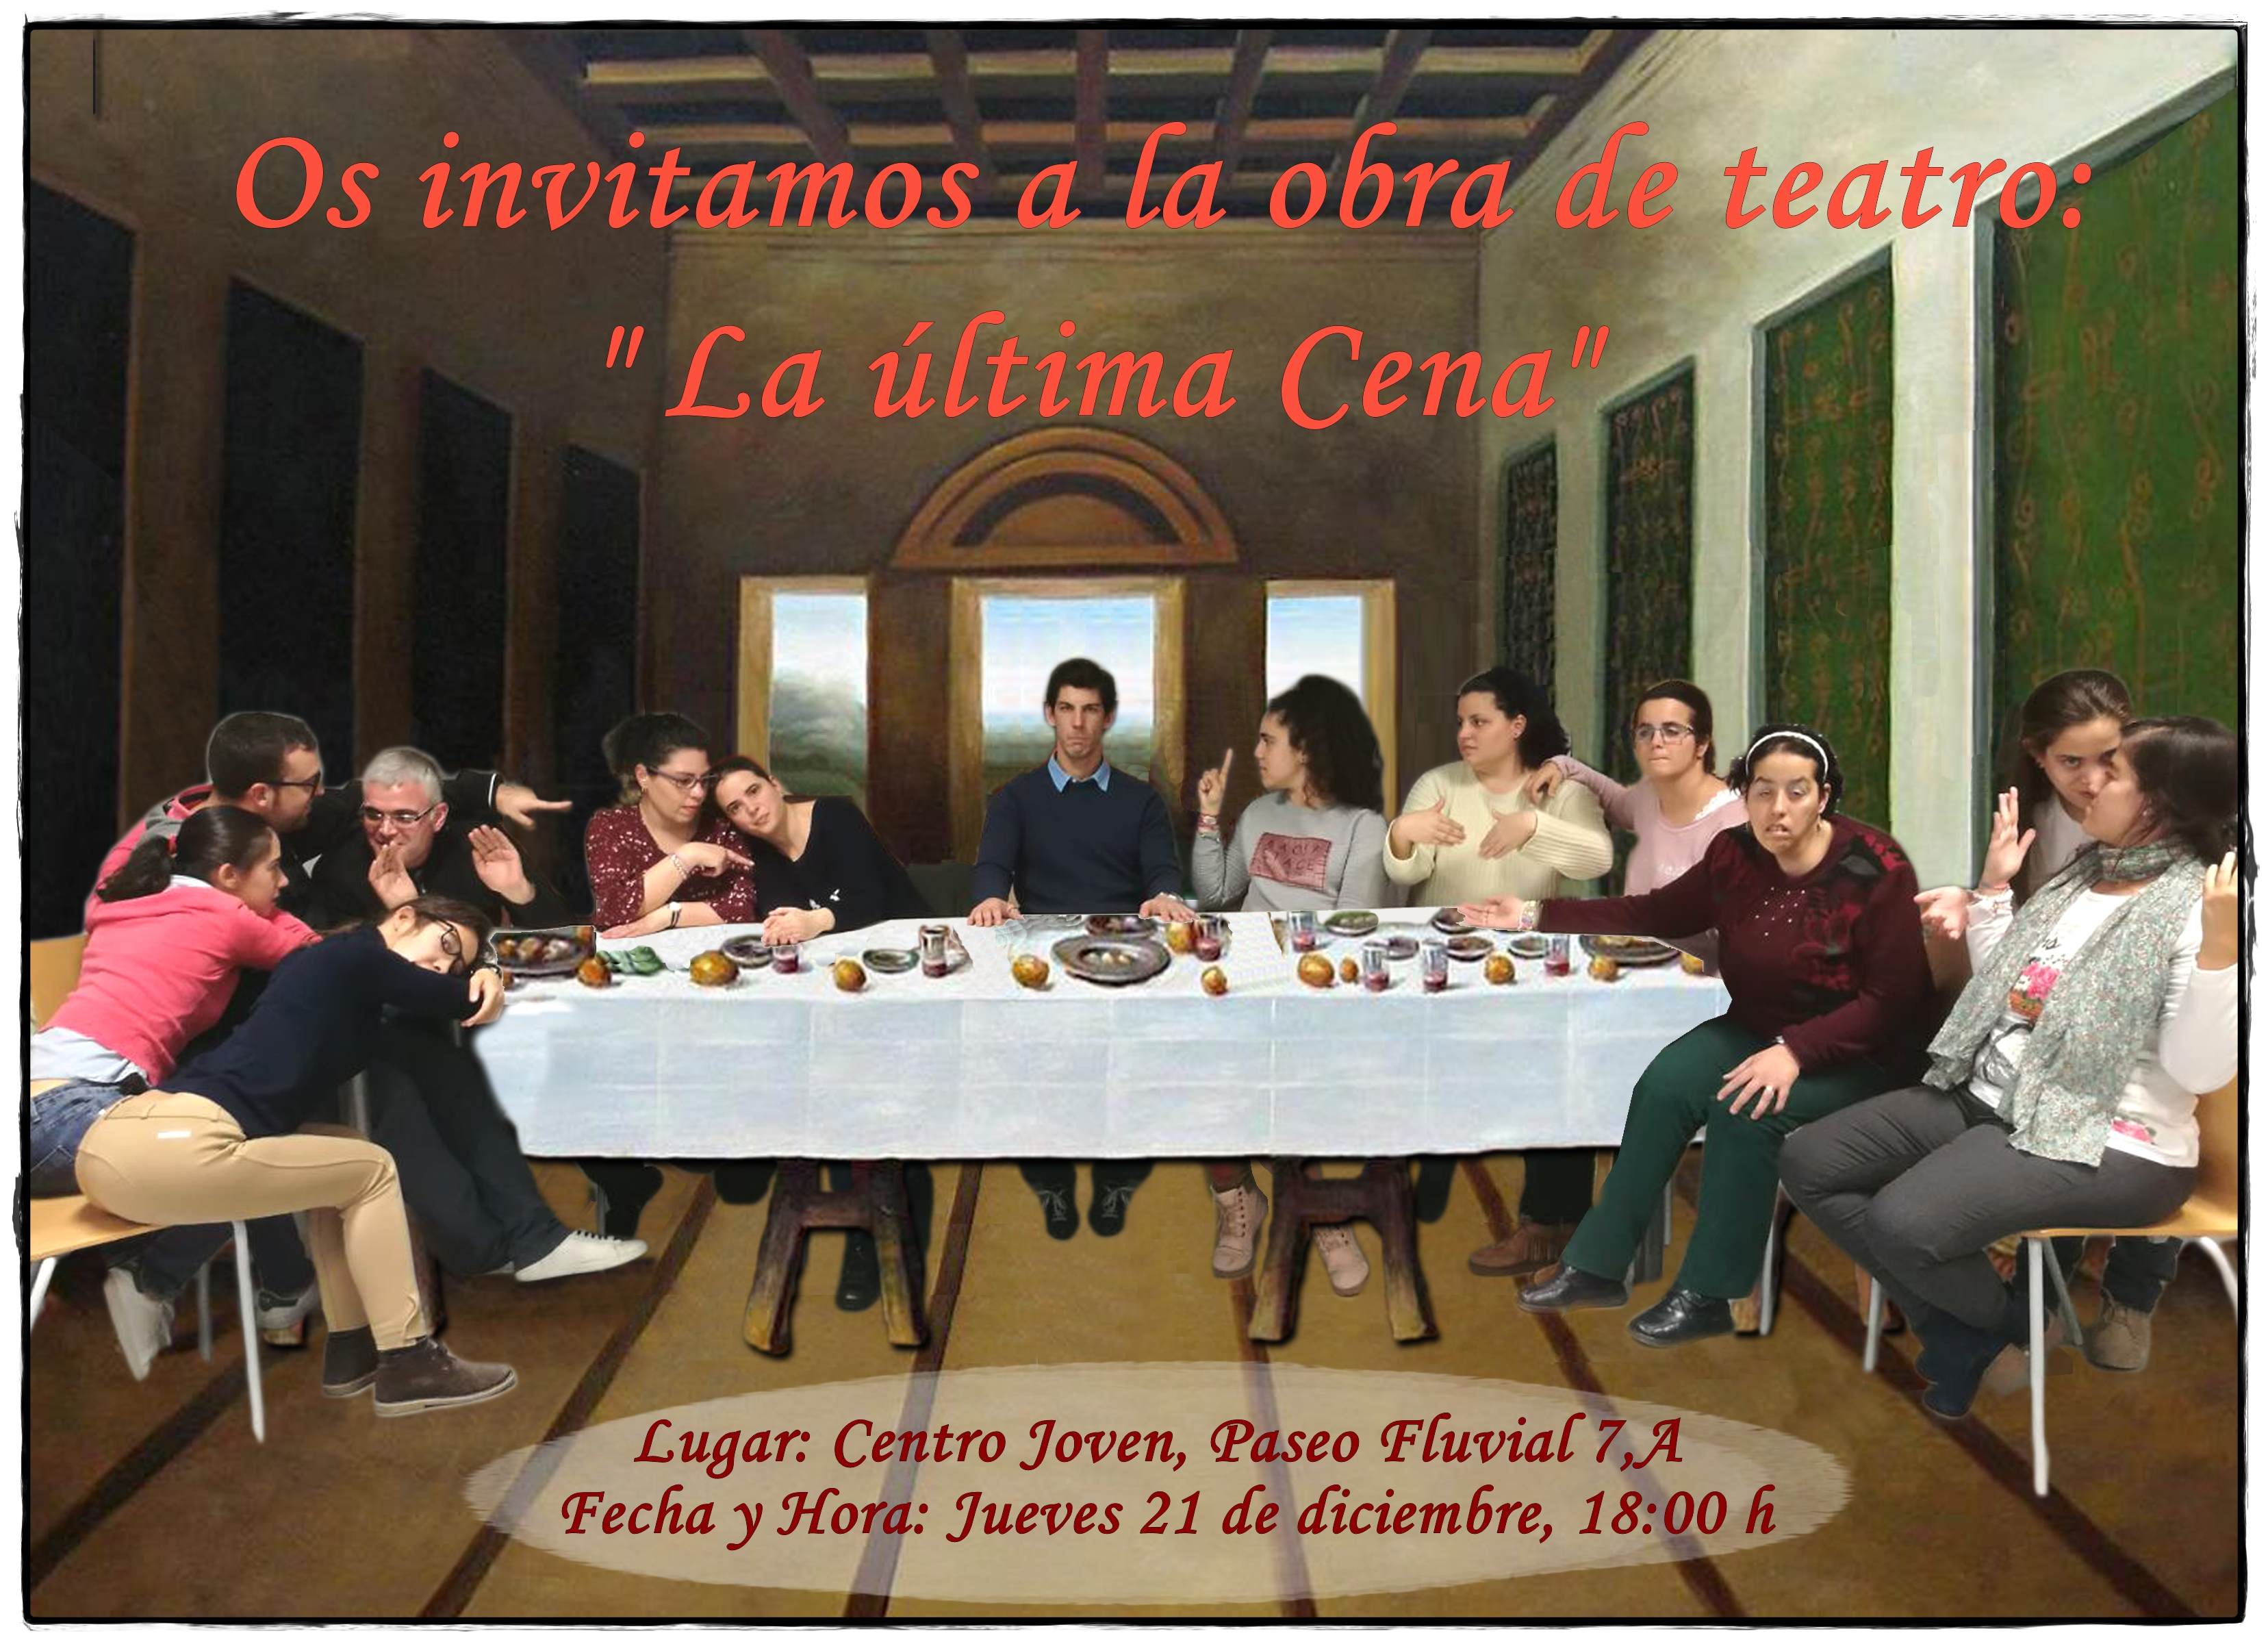 Obra de teatro: La última cena